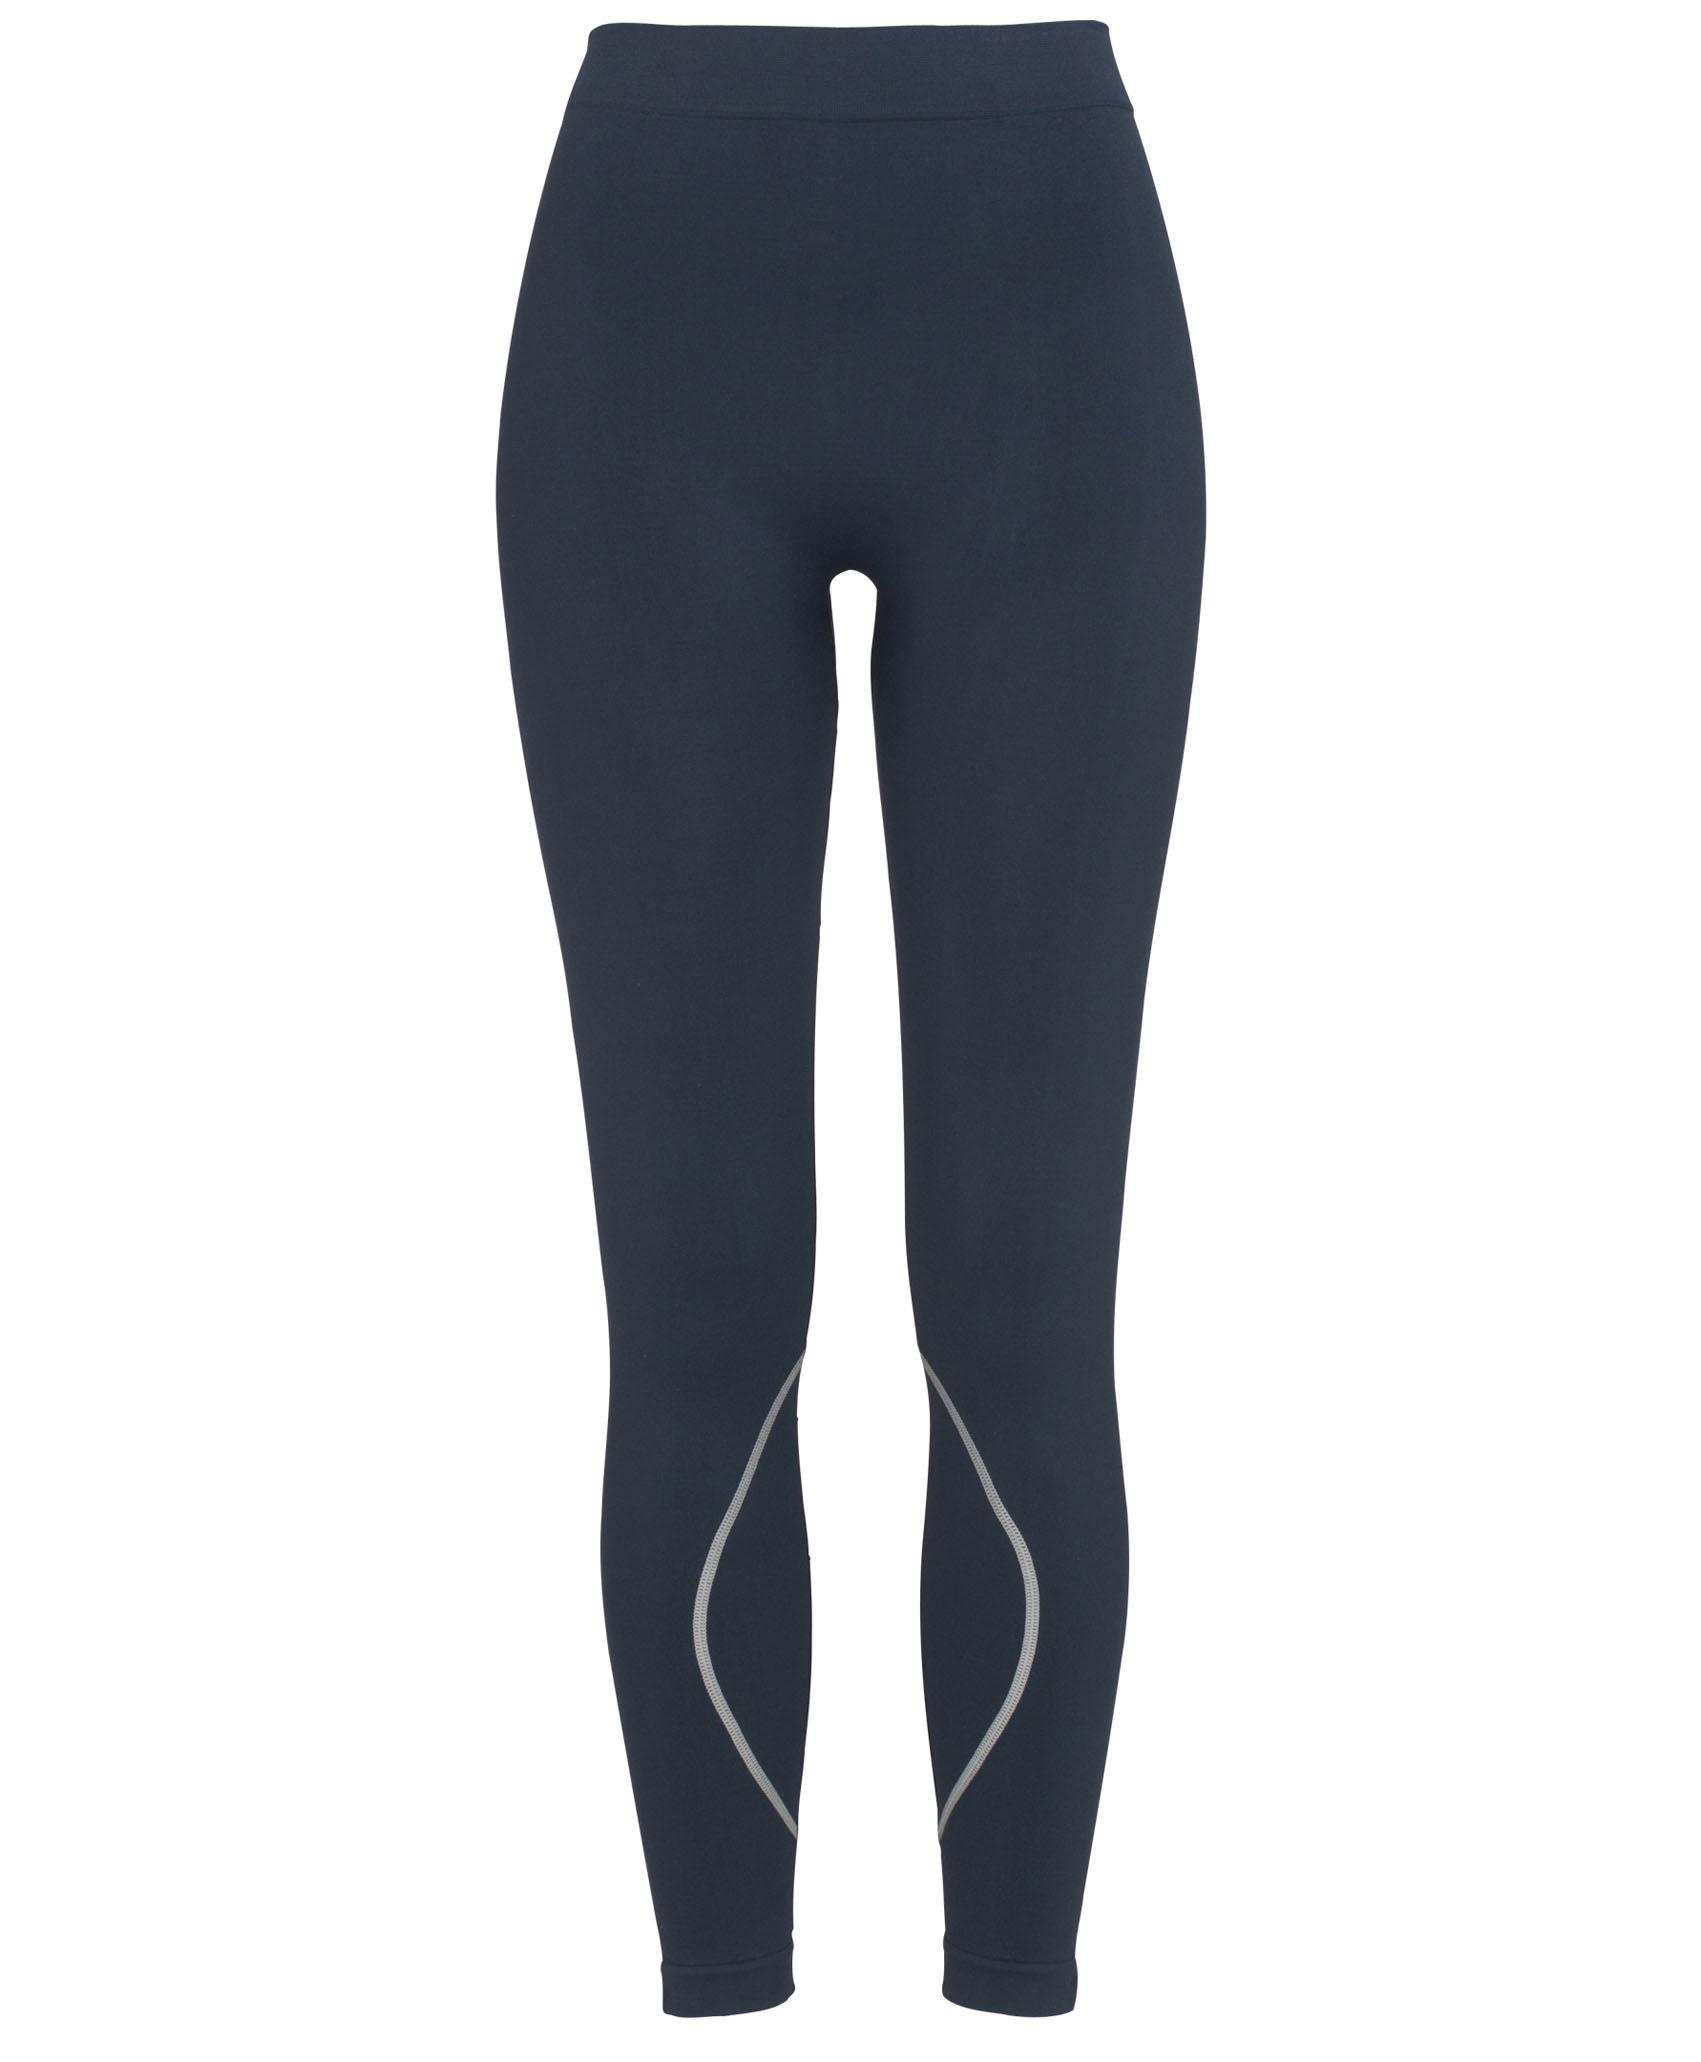 Stedman pants active seamless